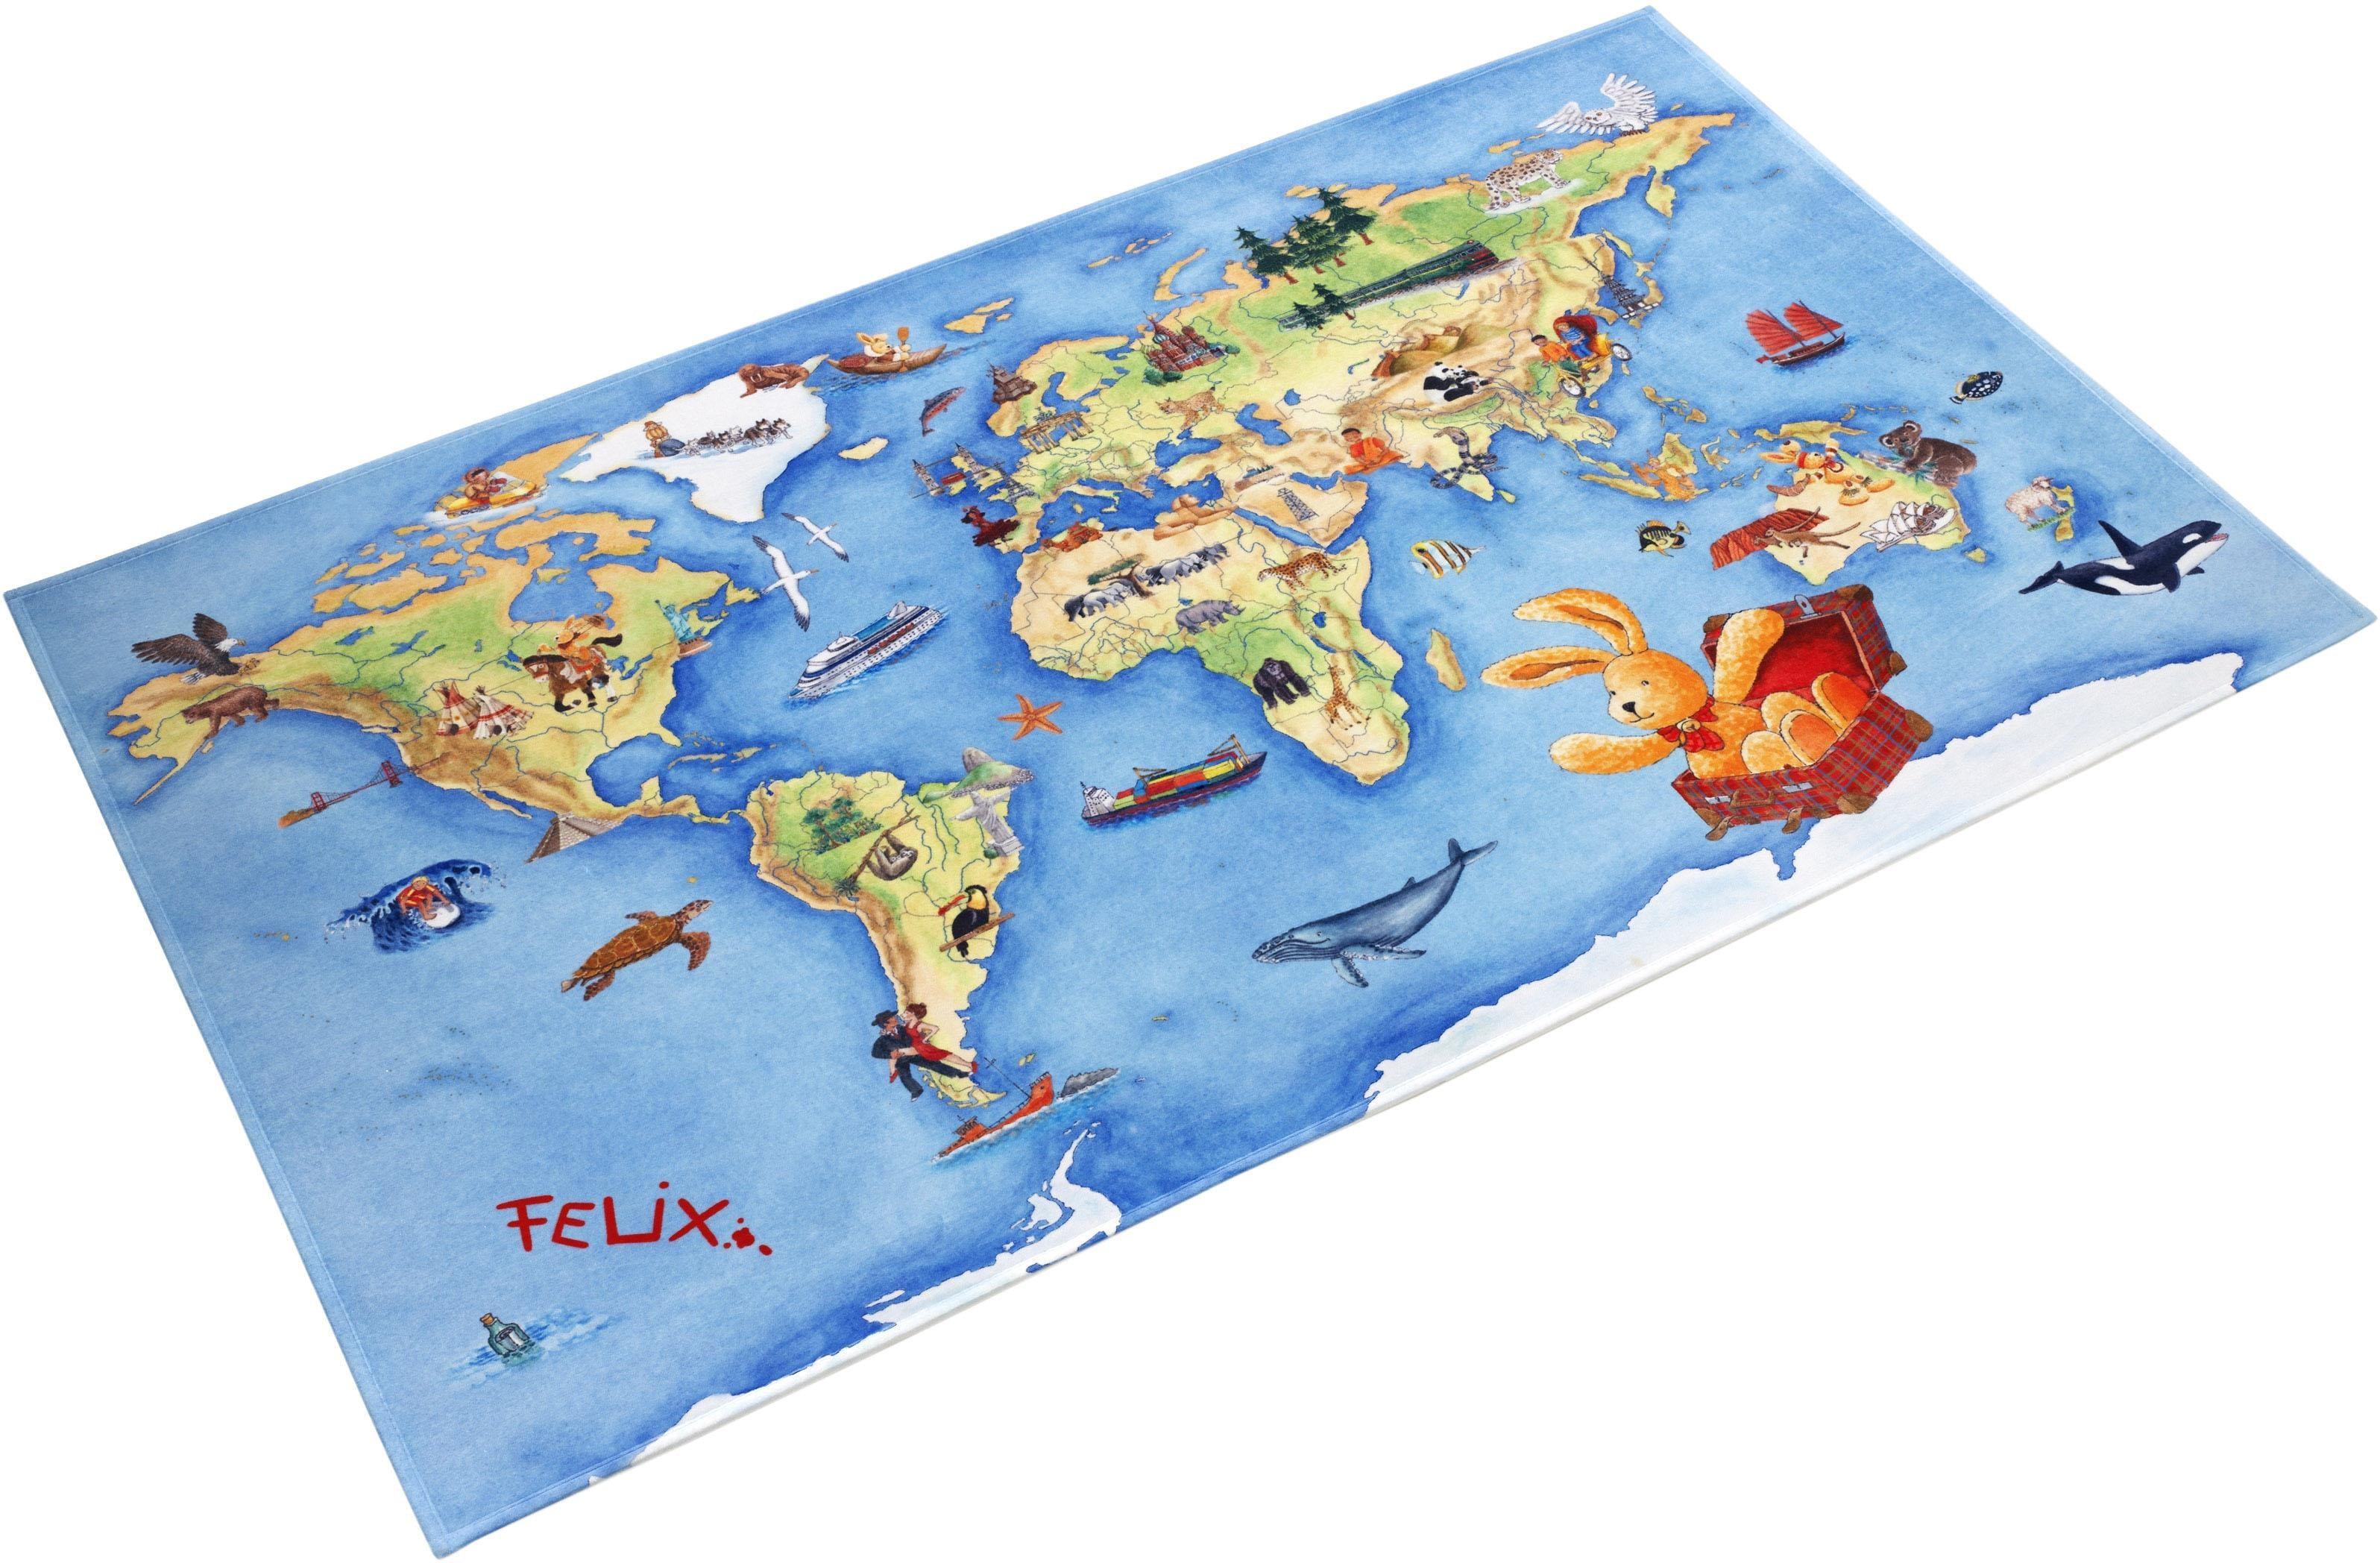 Kinderteppich FE-410 Felix der Hase rechteckig Höhe 6 mm gedruckt